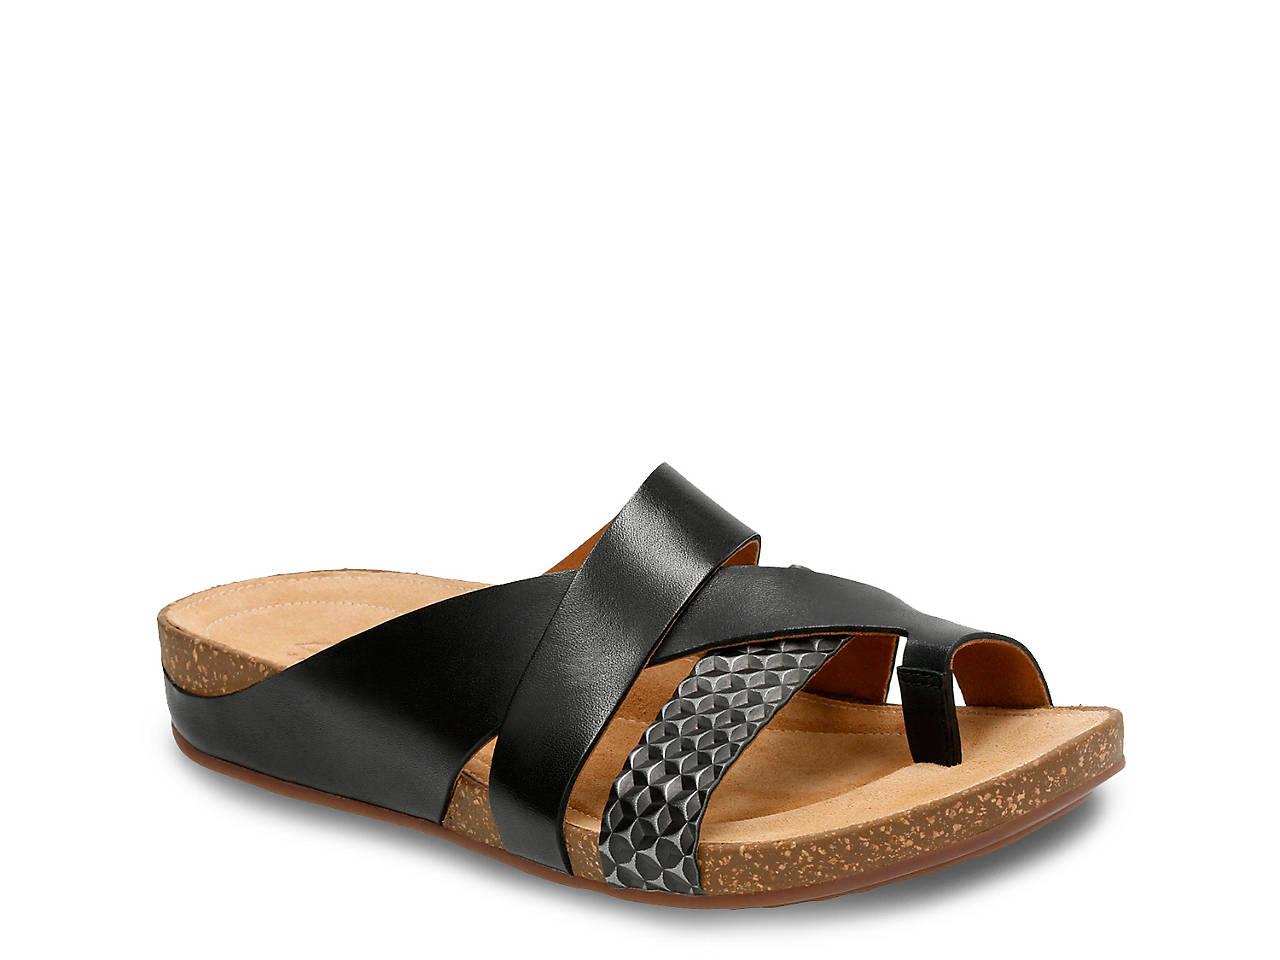 8cdb3cfcd38d Clarks Perri Bay Slide Sandal Women s Shoes